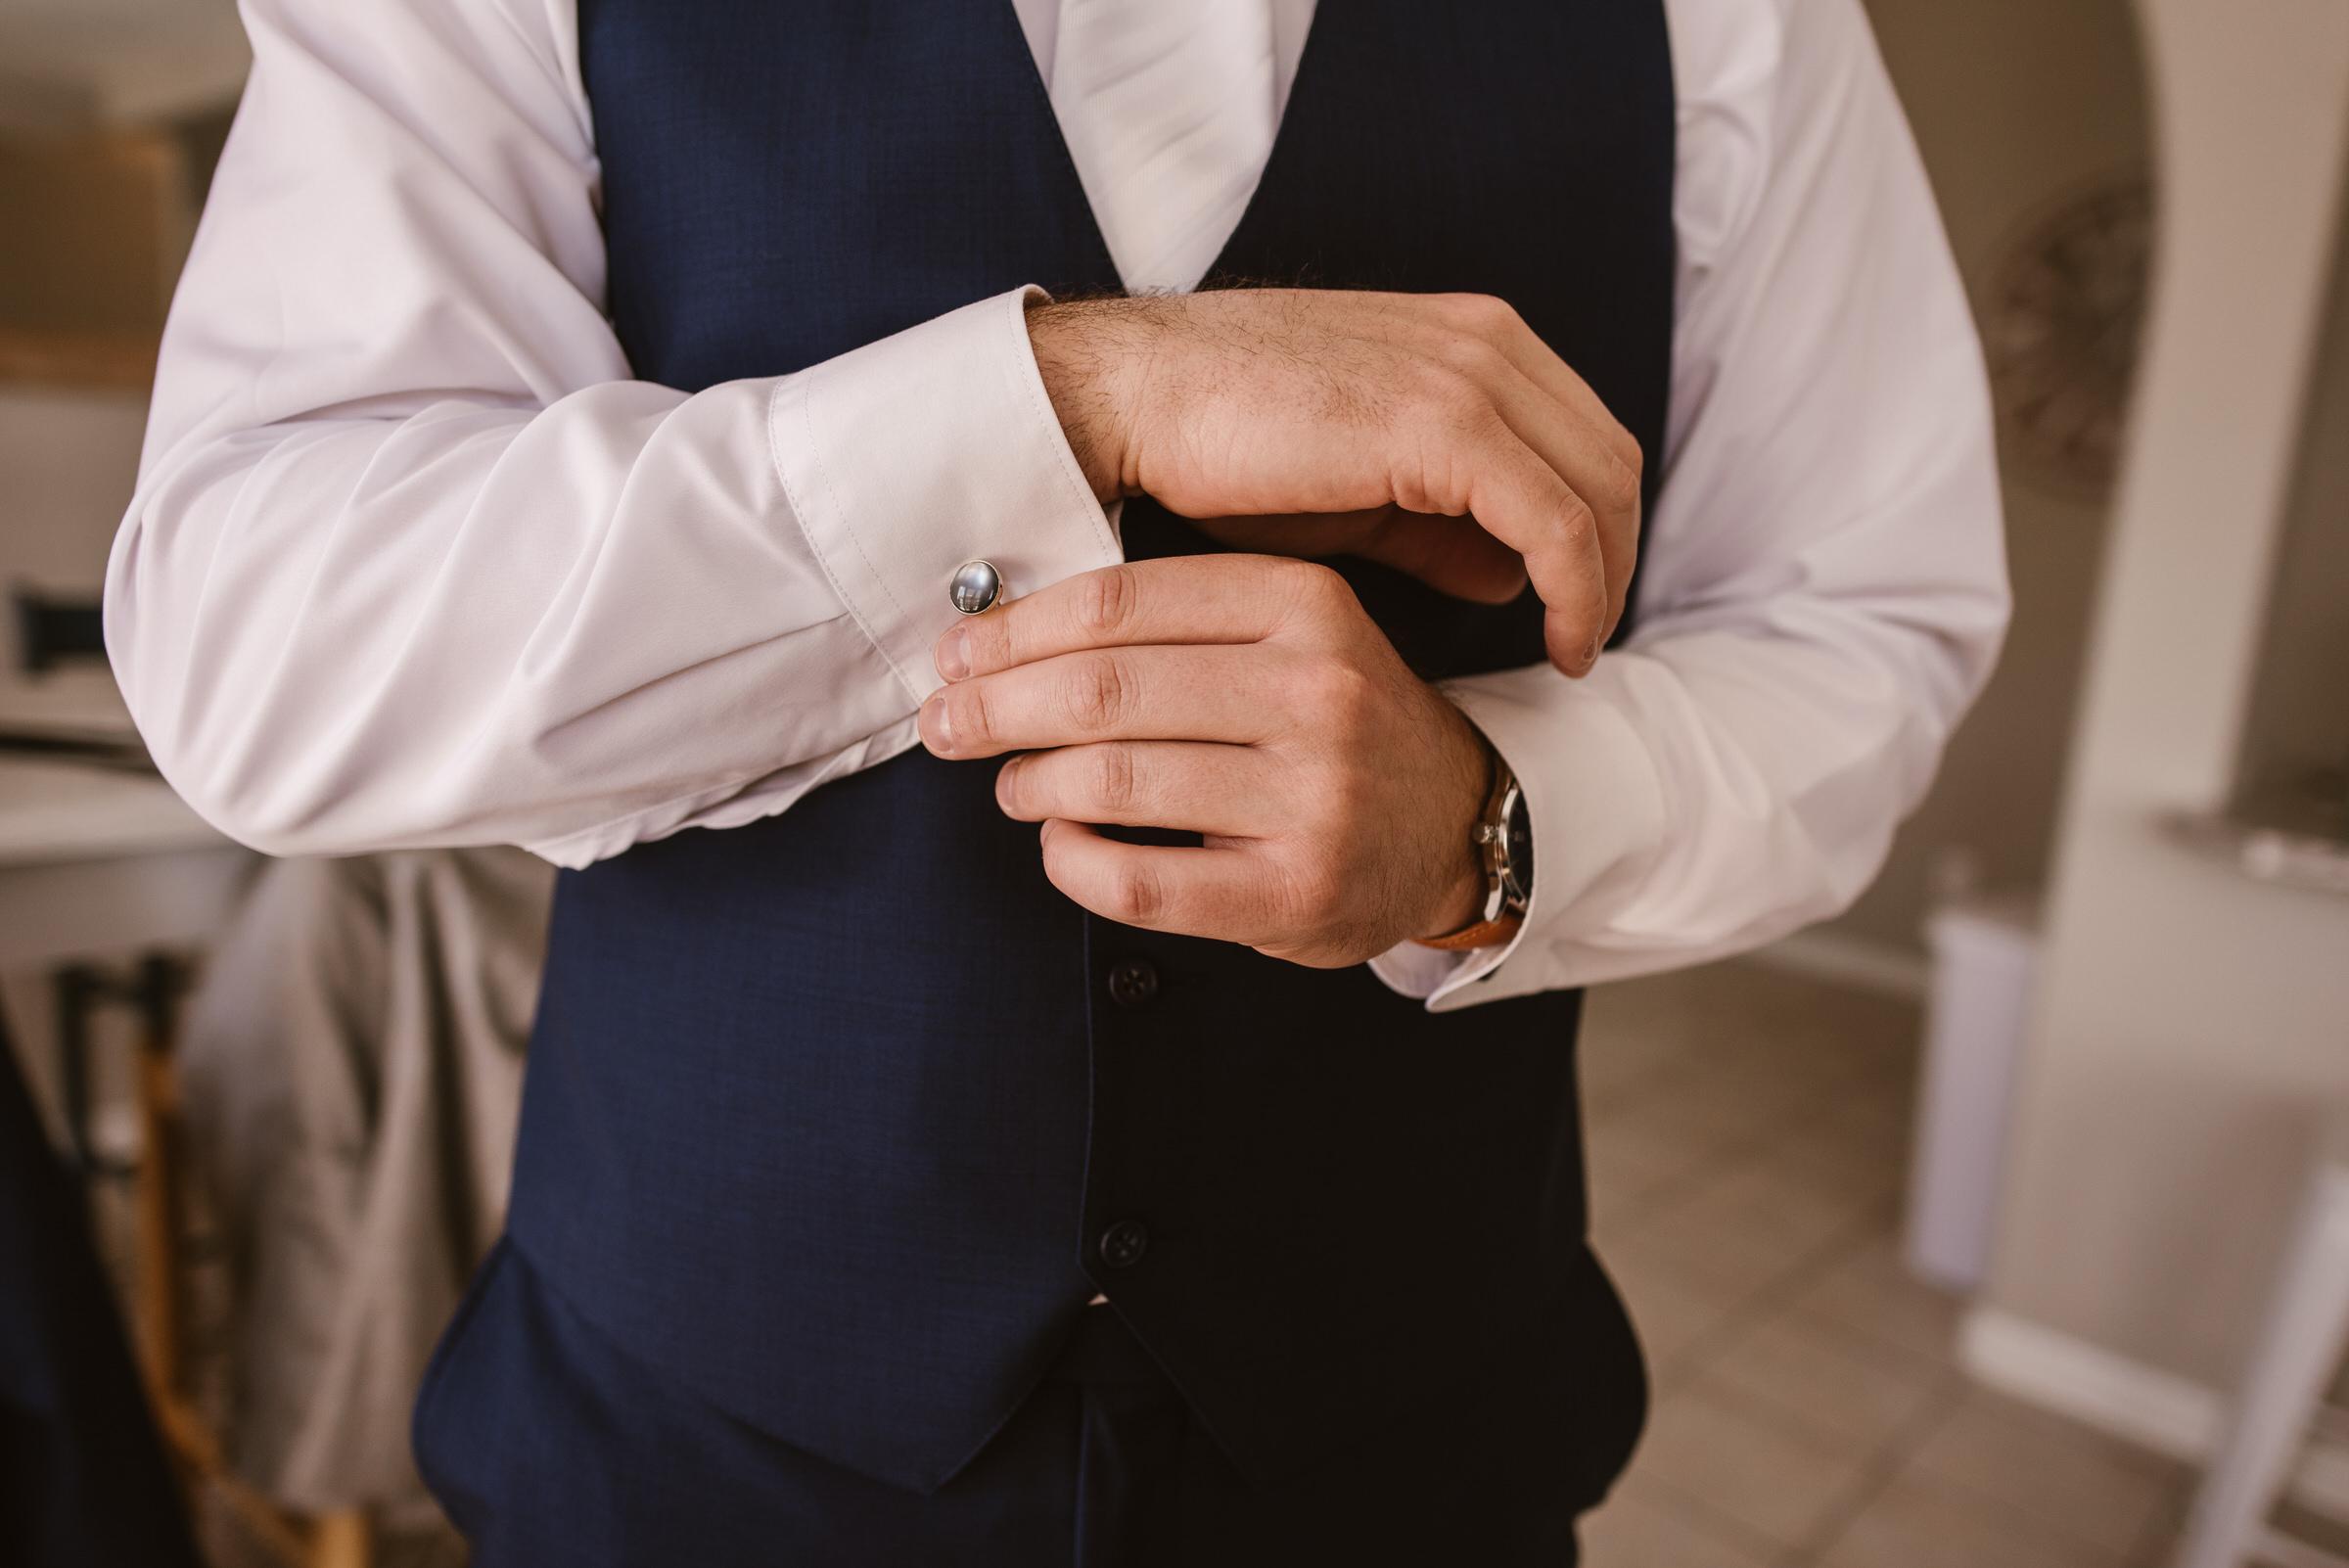 Wilderness-Ridge-Lincoln-Nebraska-Wedding-Kaylie-Sirek-Photography-007.jpg